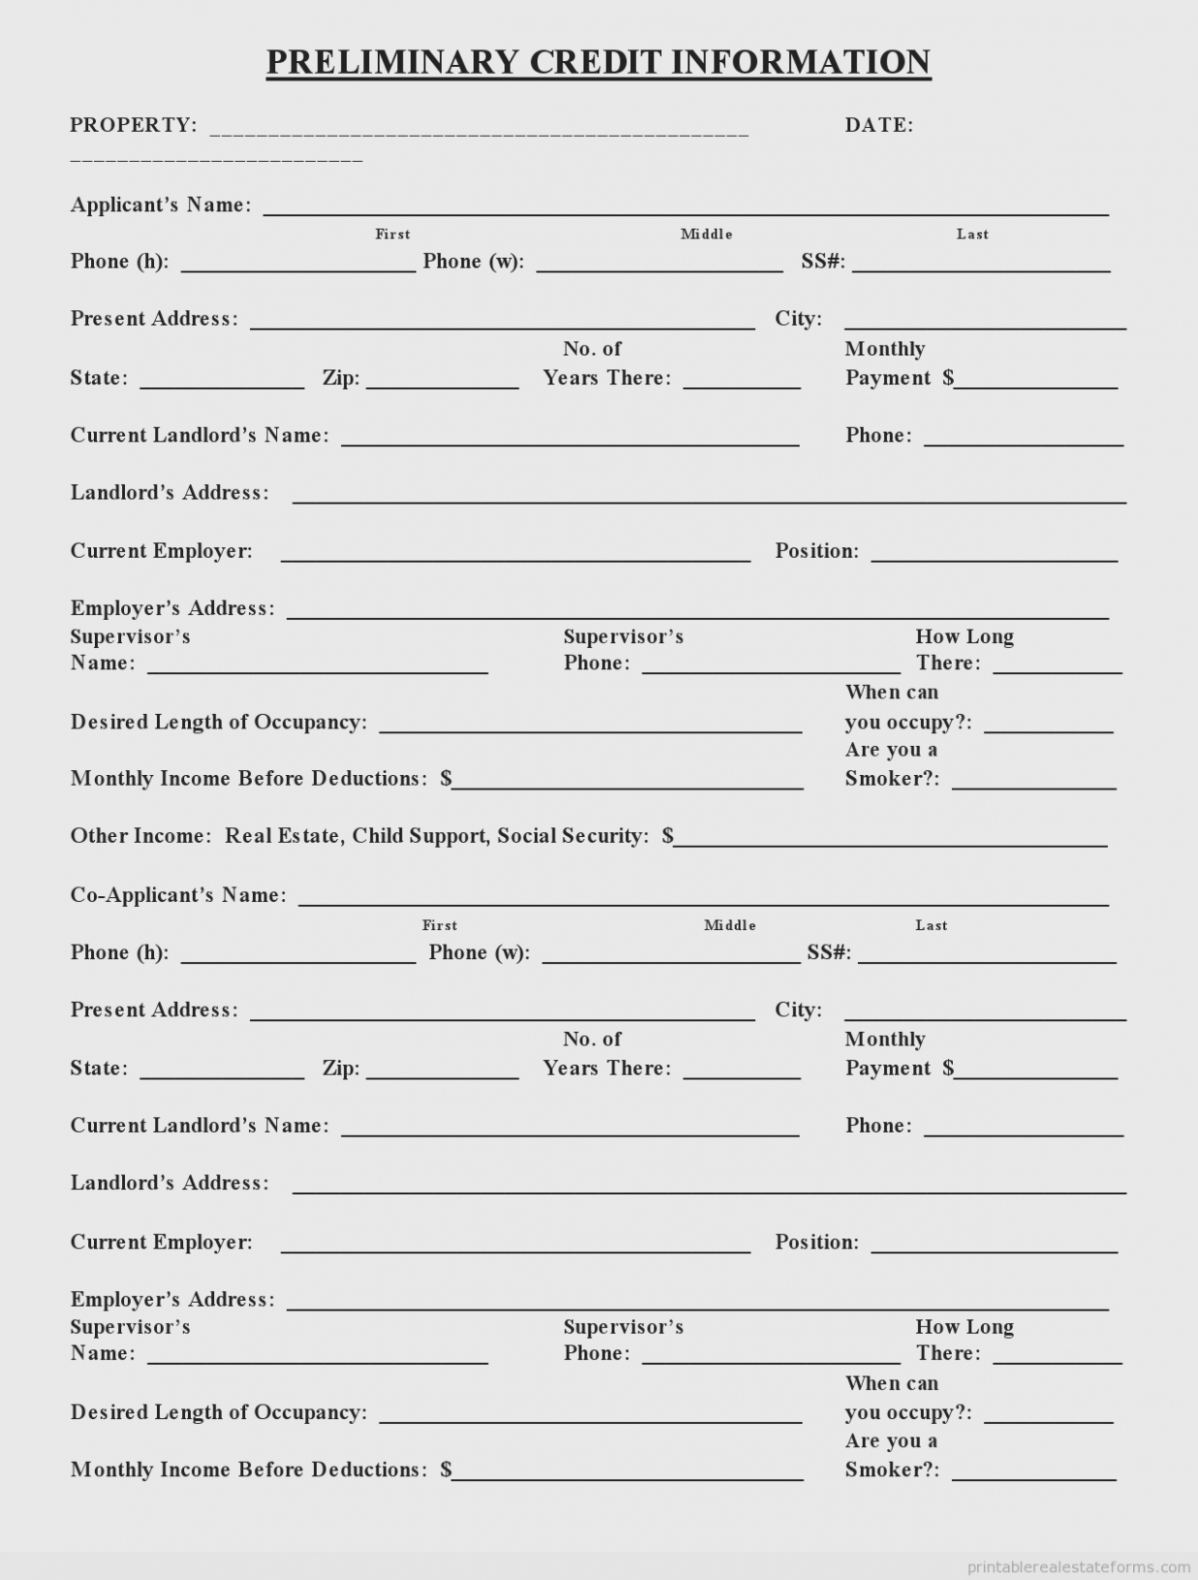 Transunion Printable Dispute Form 13 Best S Of Free Credit Report - Free Credit Report Printable Form